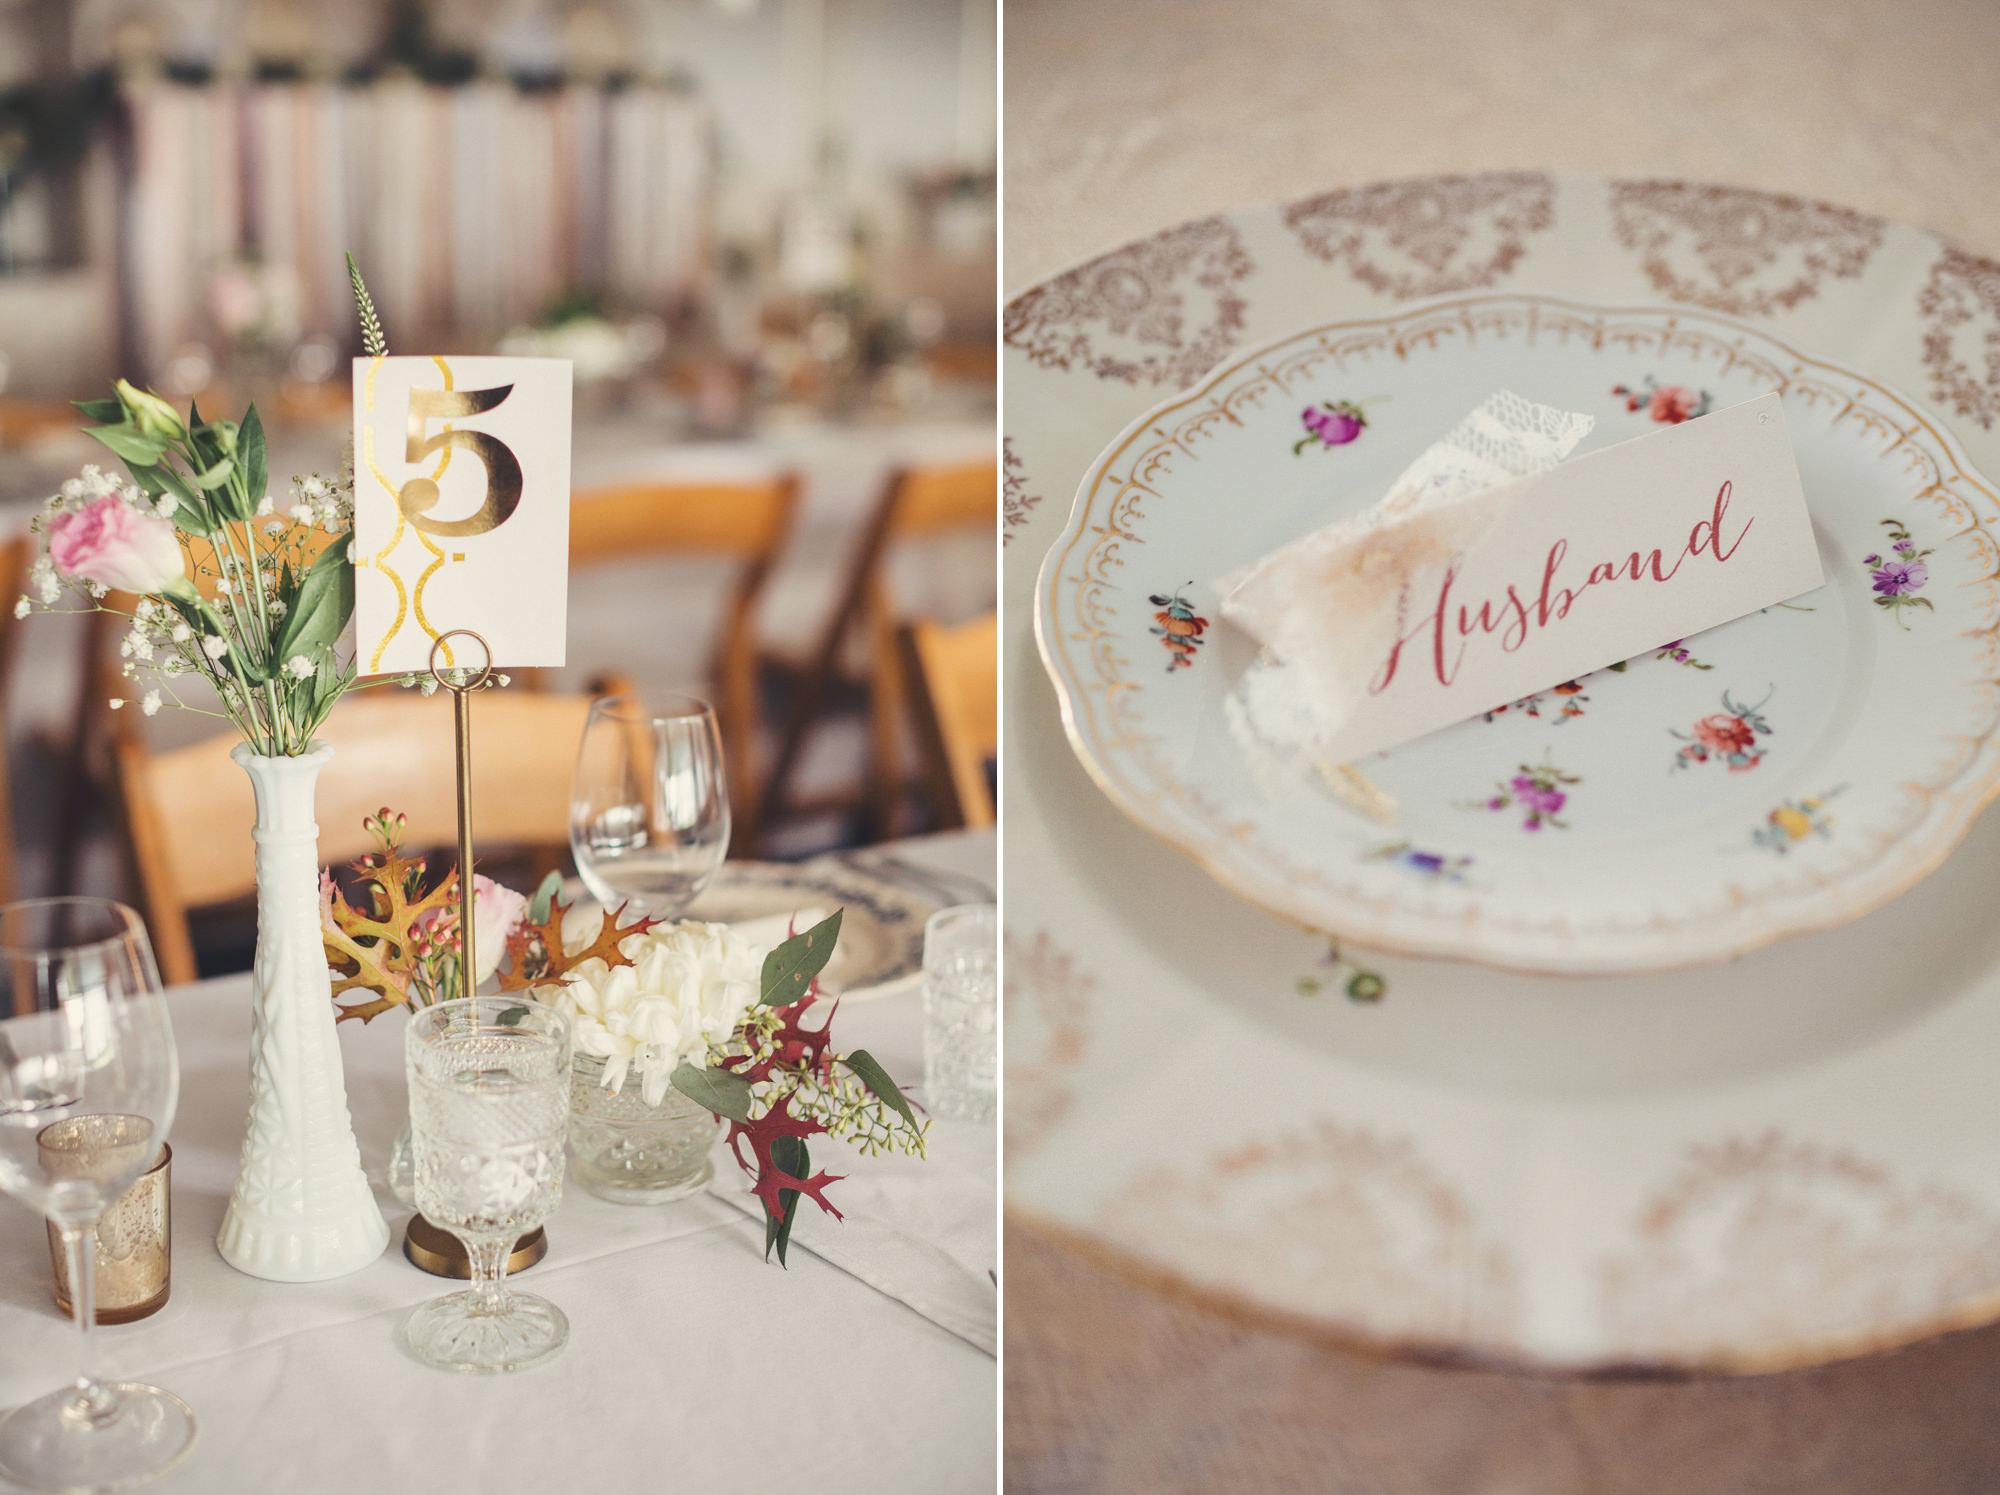 Little River Inn Wedding@Anne-Claire Brun 163